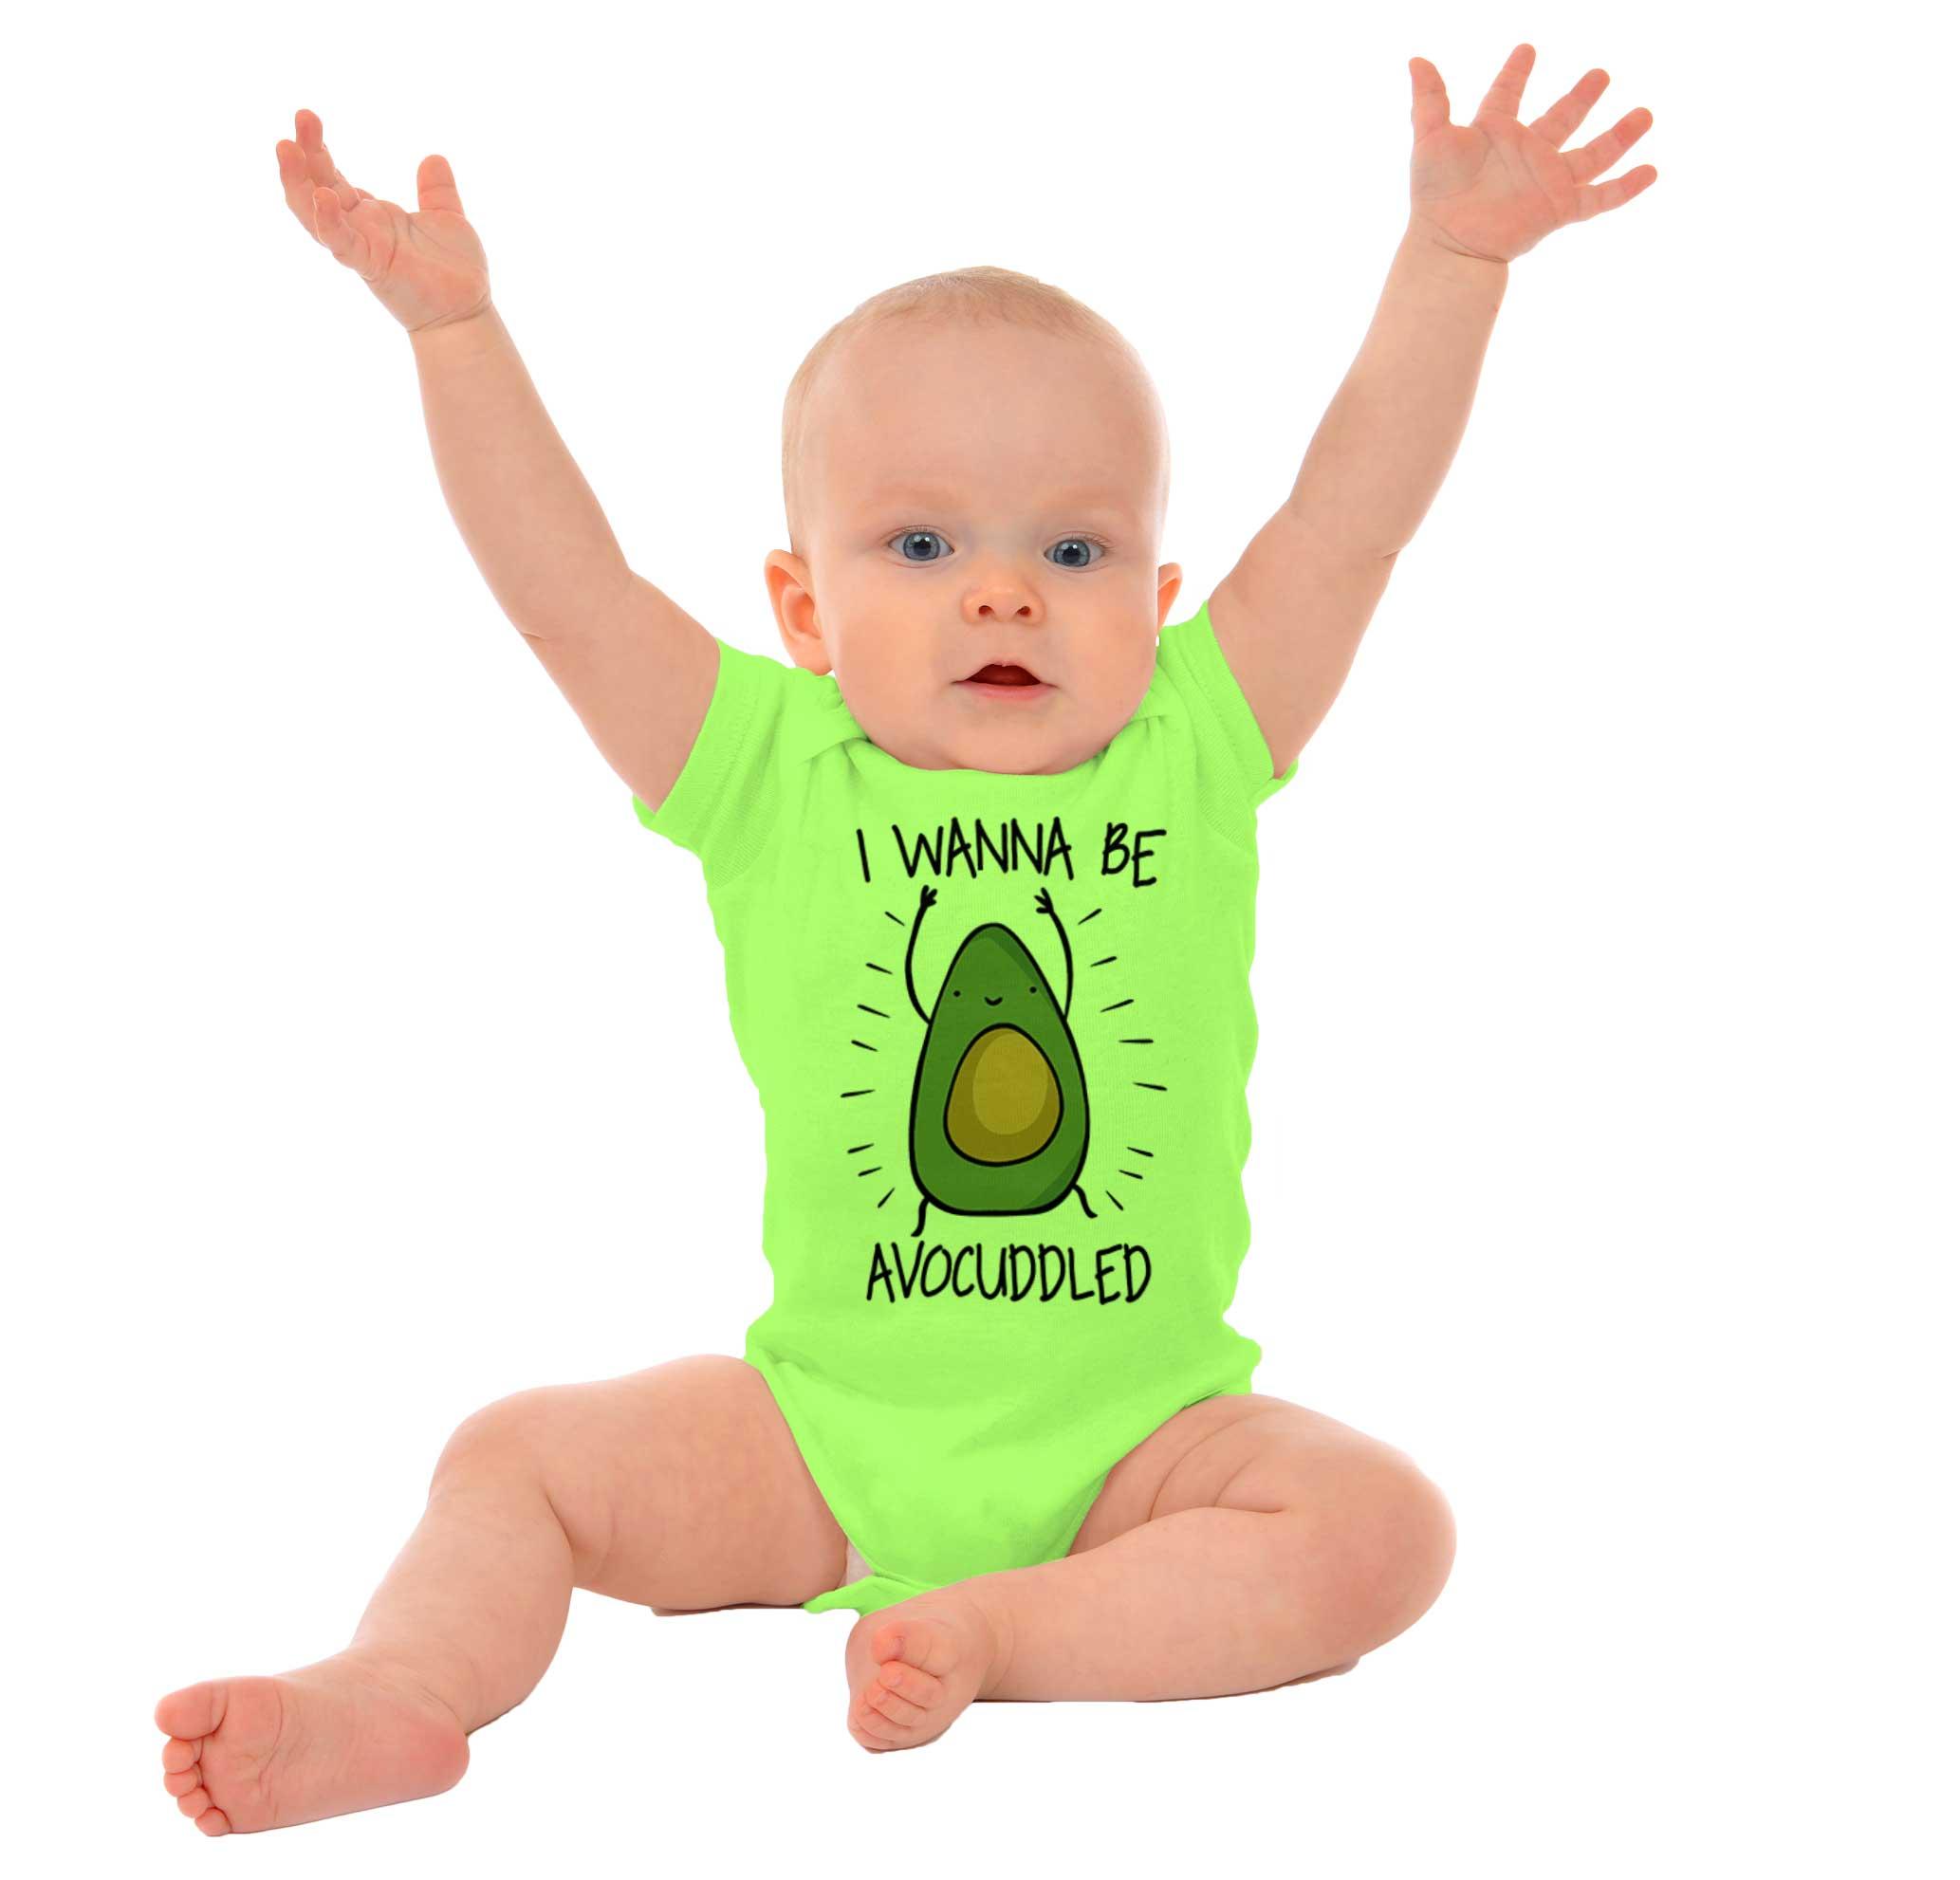 Avocado I No Fat Baby Boys Girls Jumpsuit Short-Sleeve Romper Bodysuit